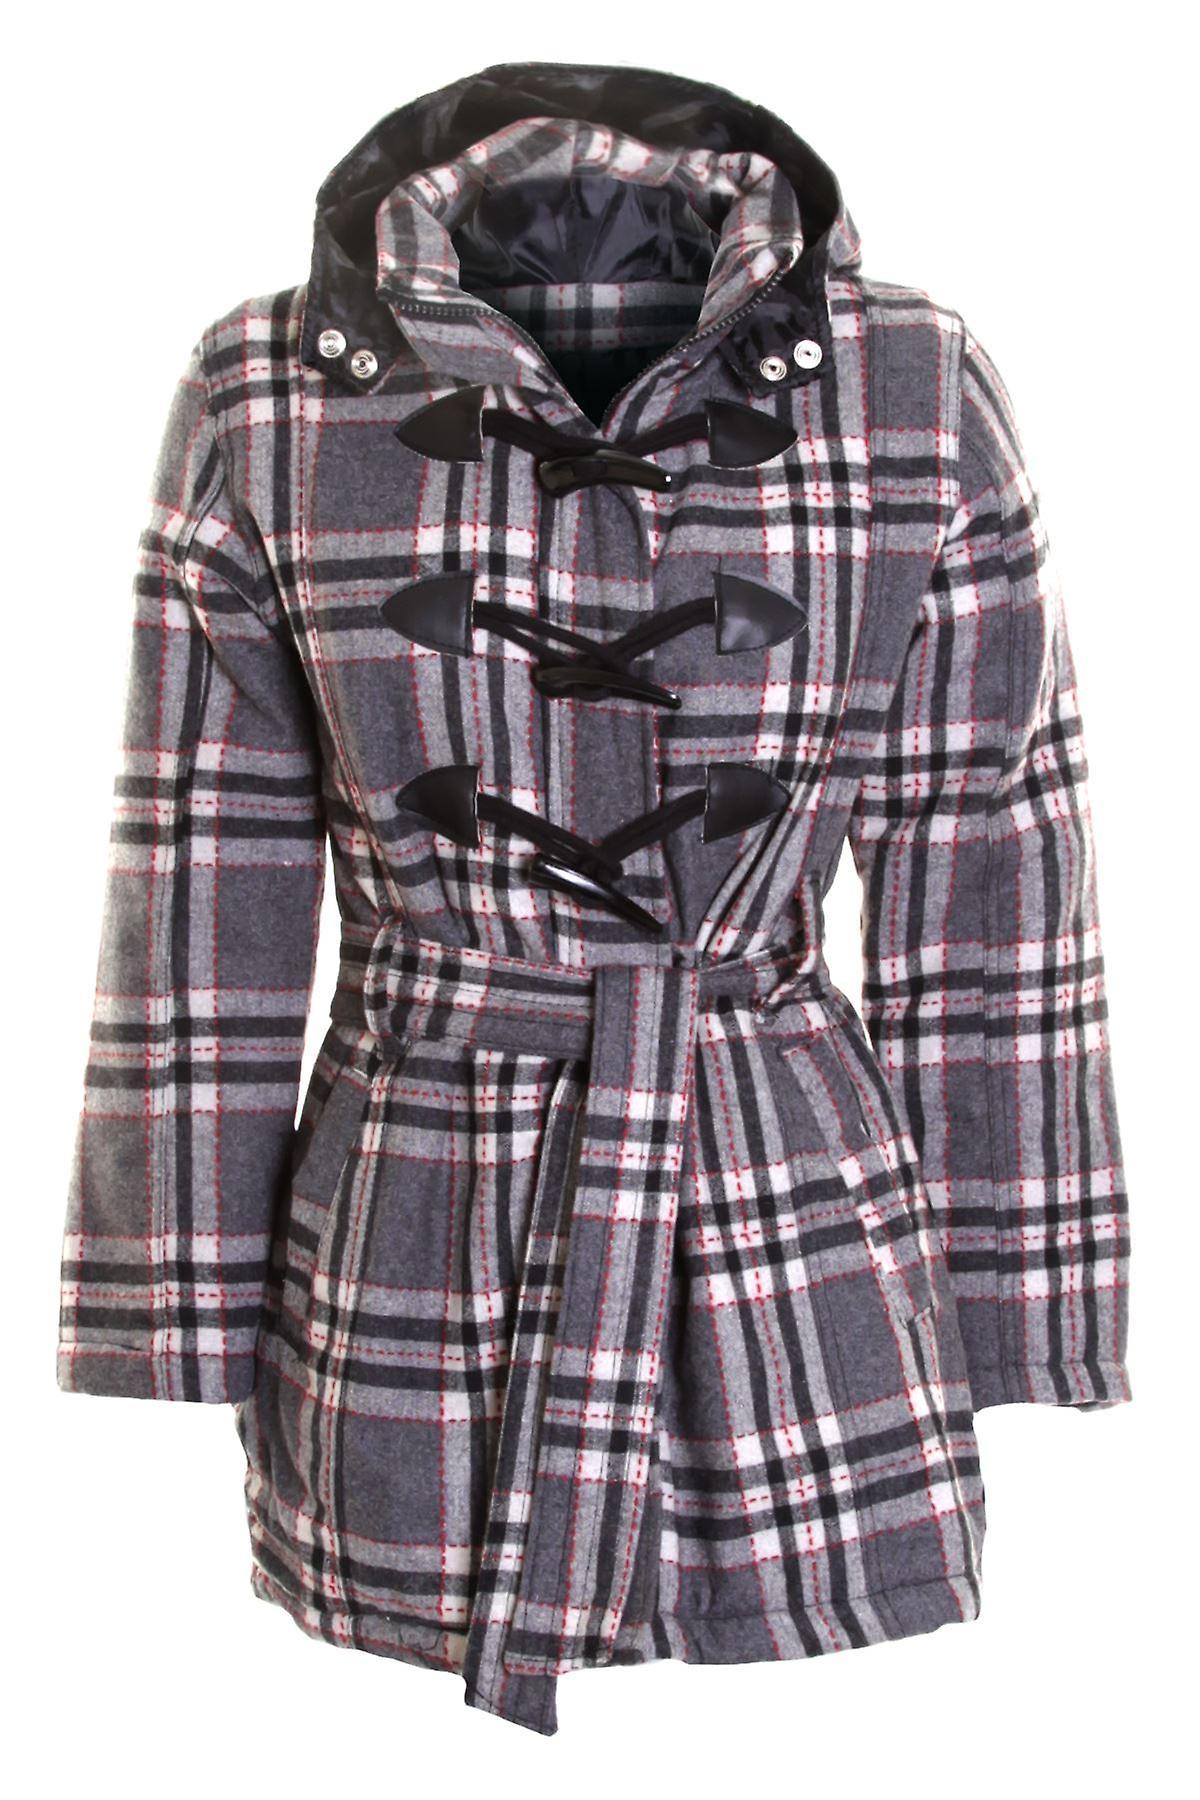 Ladies Check Hoody Hooded Coat Womens Quilted Duffle Jacket